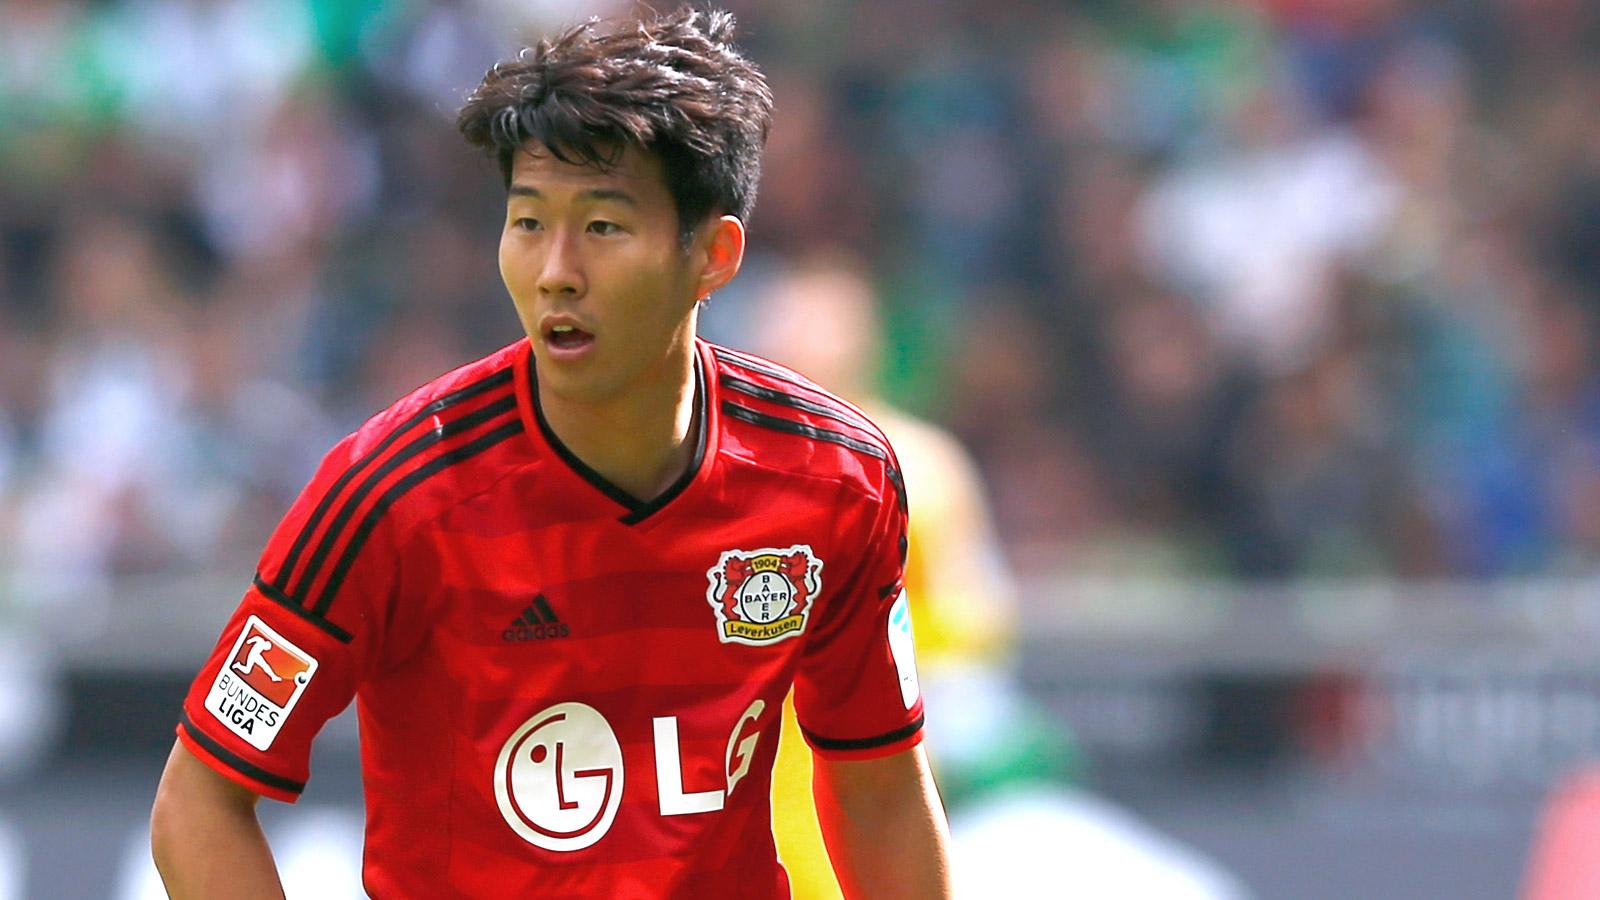 Bayer Leverkusen unhappy with Spurs target Son